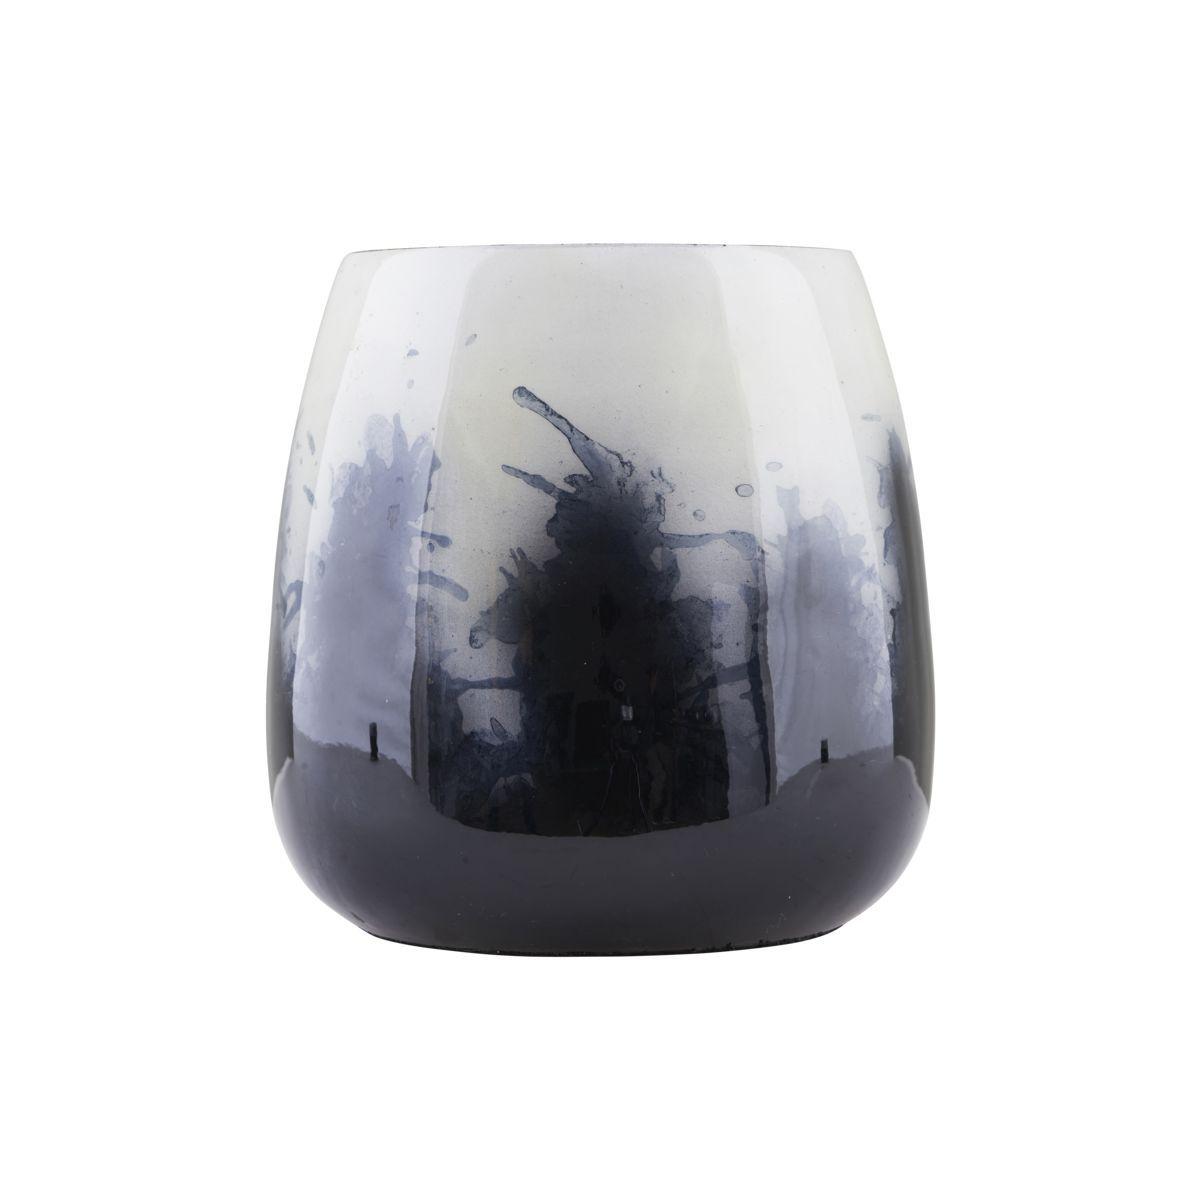 House Doctor Large Black, White & Indigo Abstract Planter - Trouva